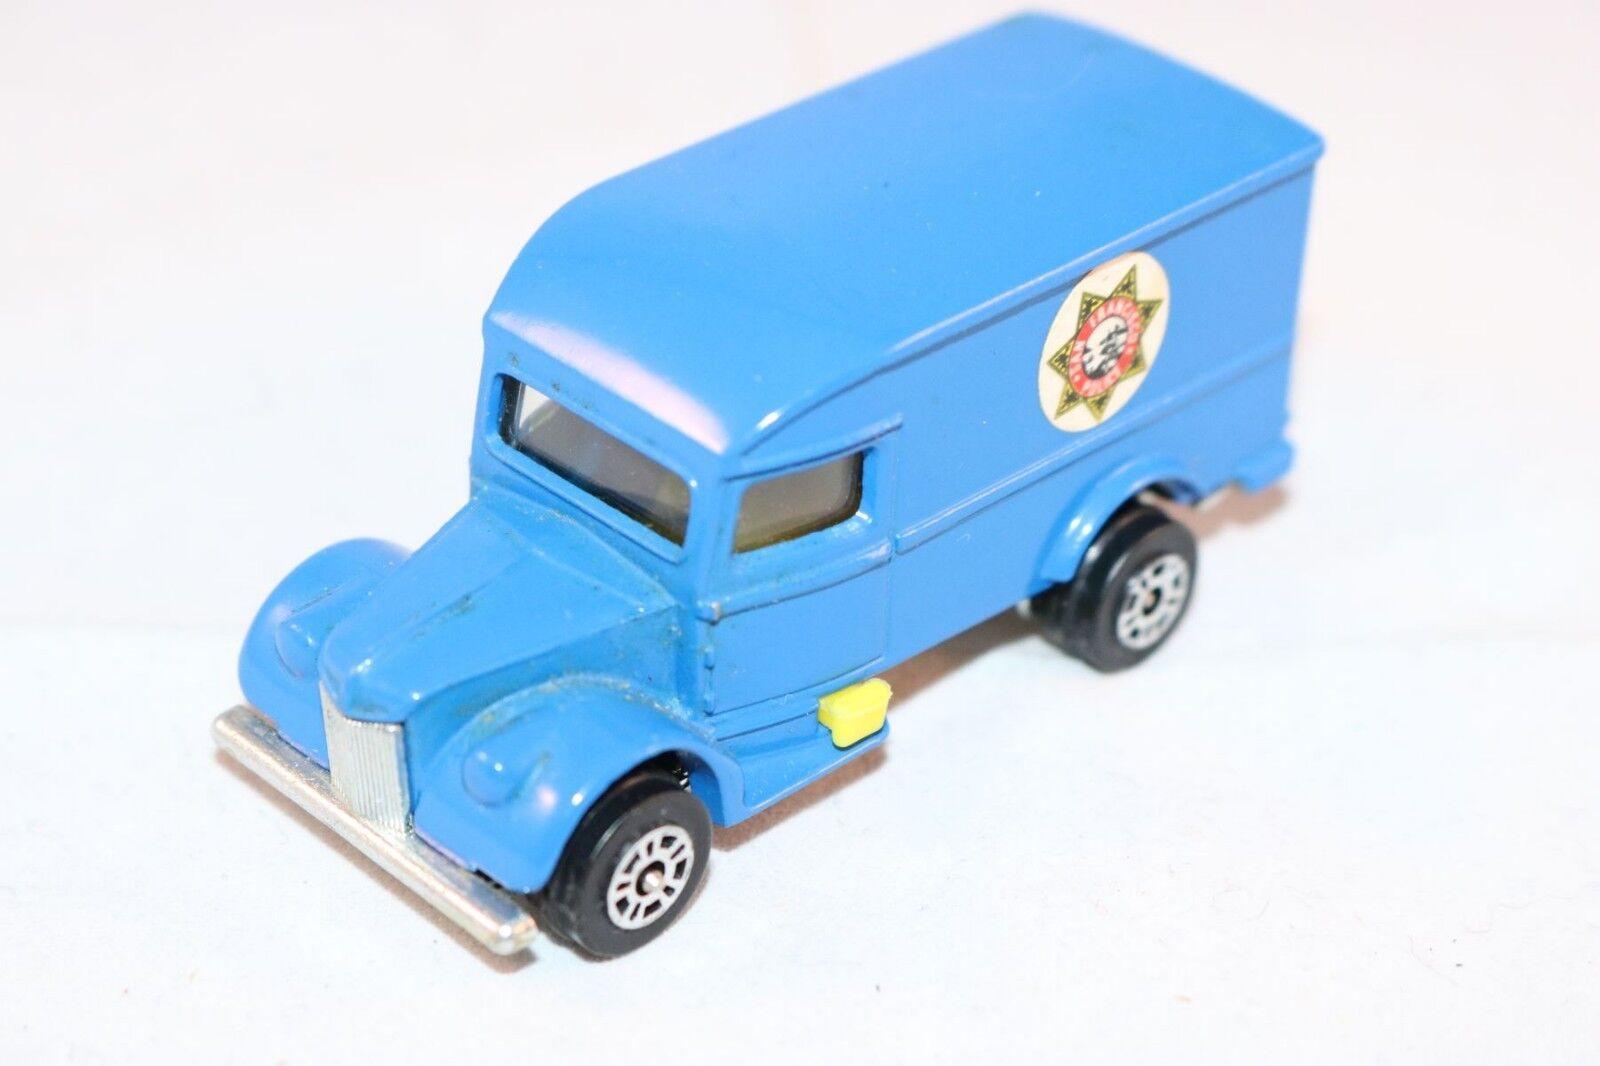 Corgi JUNIORS - 1007 Ironside - azul perfect mint original condition